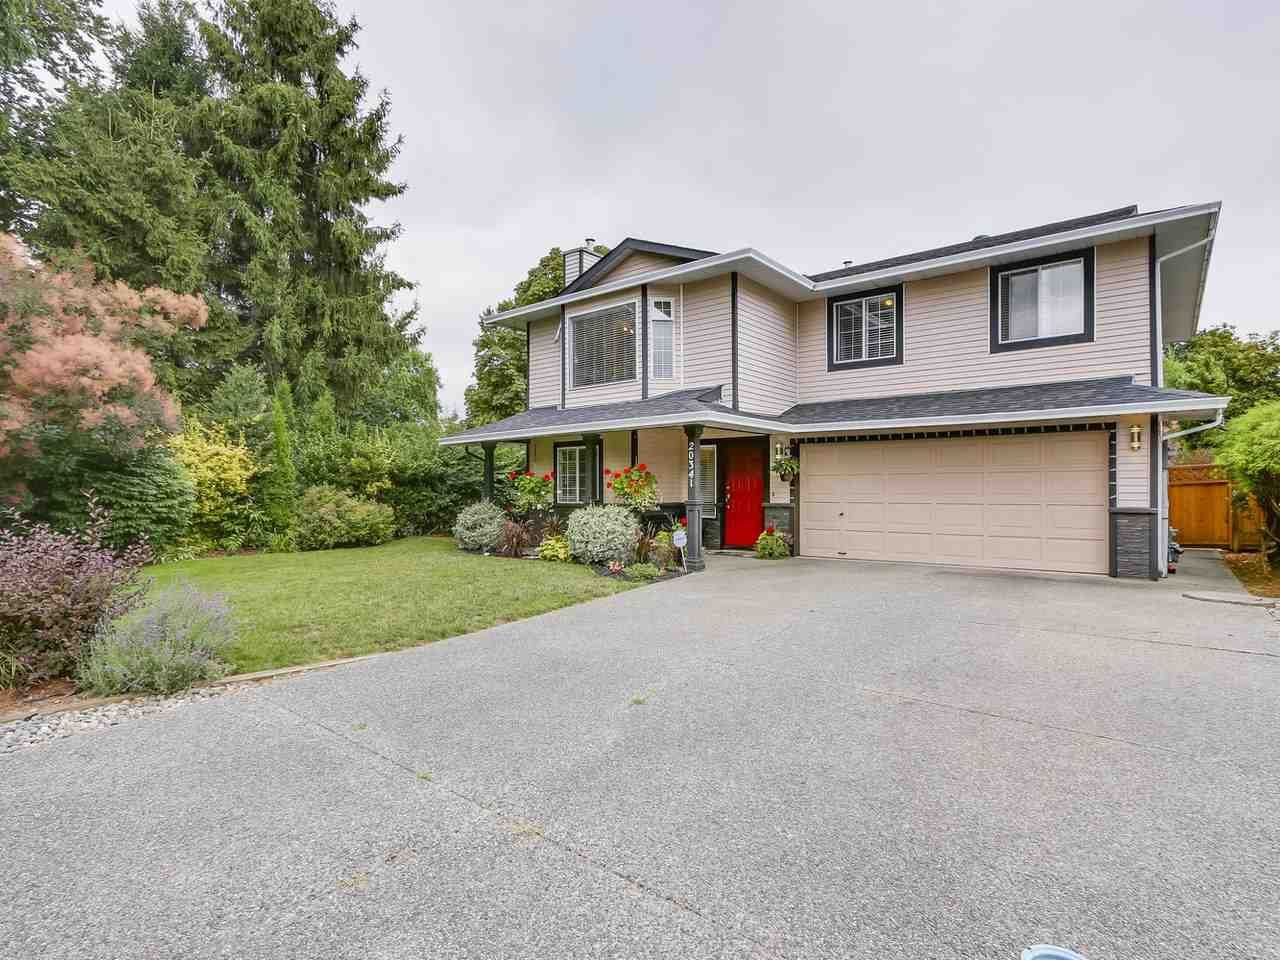 Main Photo: 20341 WALNUT Crescent in Maple Ridge: Southwest Maple Ridge House for sale : MLS®# R2199123